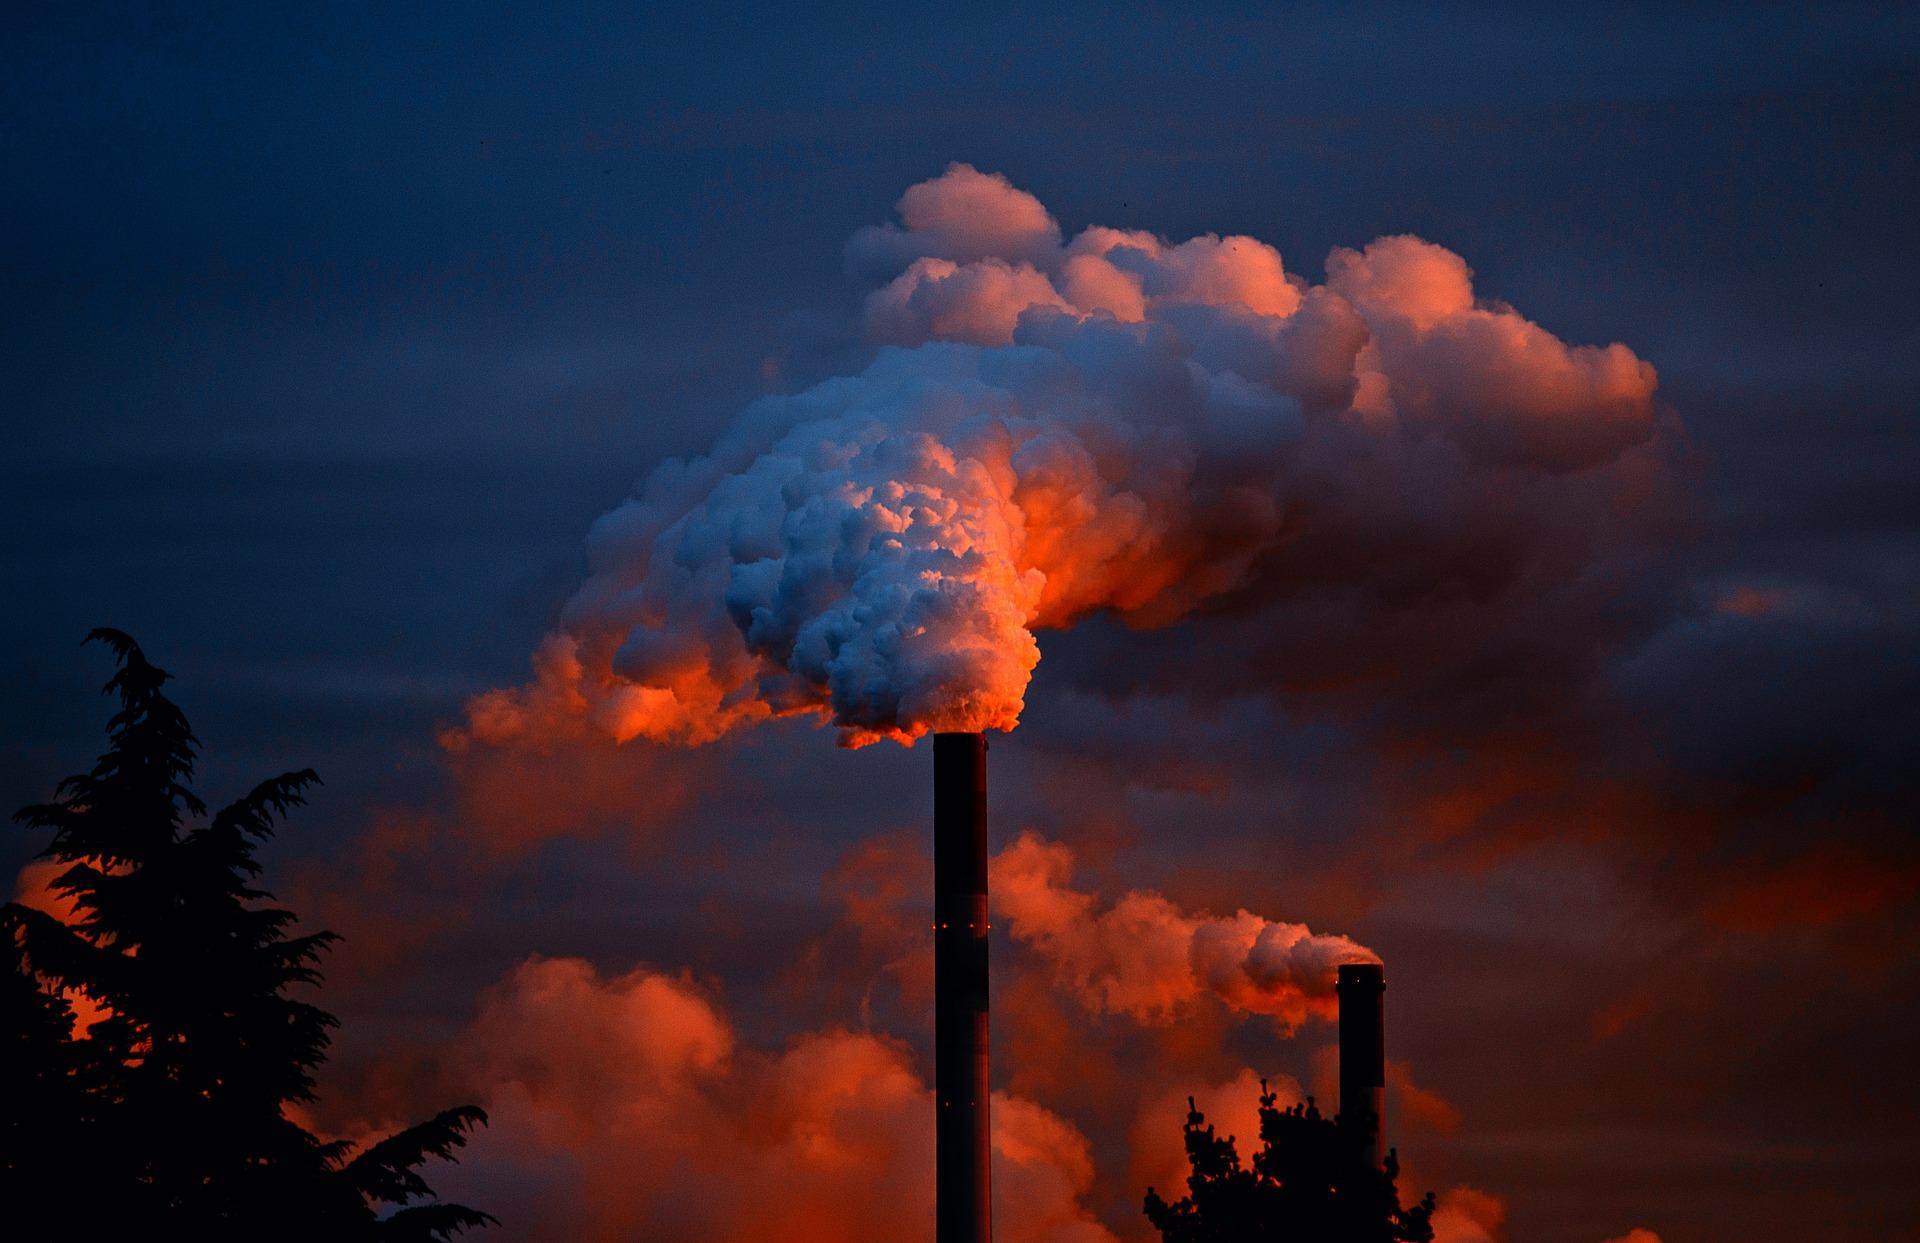 Jiangsu steelmakers to reach ultra-low emissions standards